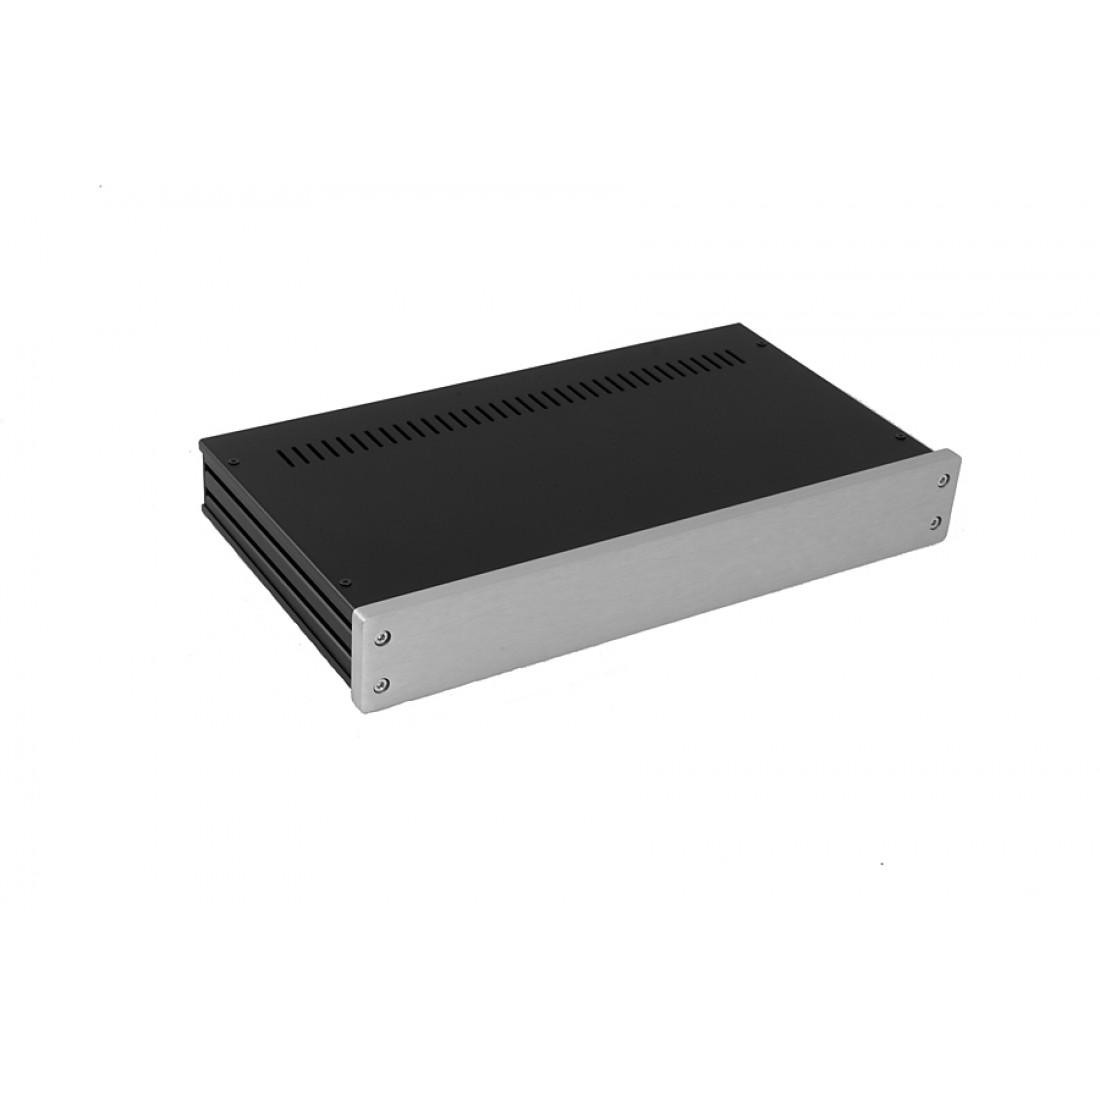 1NGX347 - 1U Galaxy krabice, 330 x 170 x 40mm, 10mm panel stříbrný, Fe víka